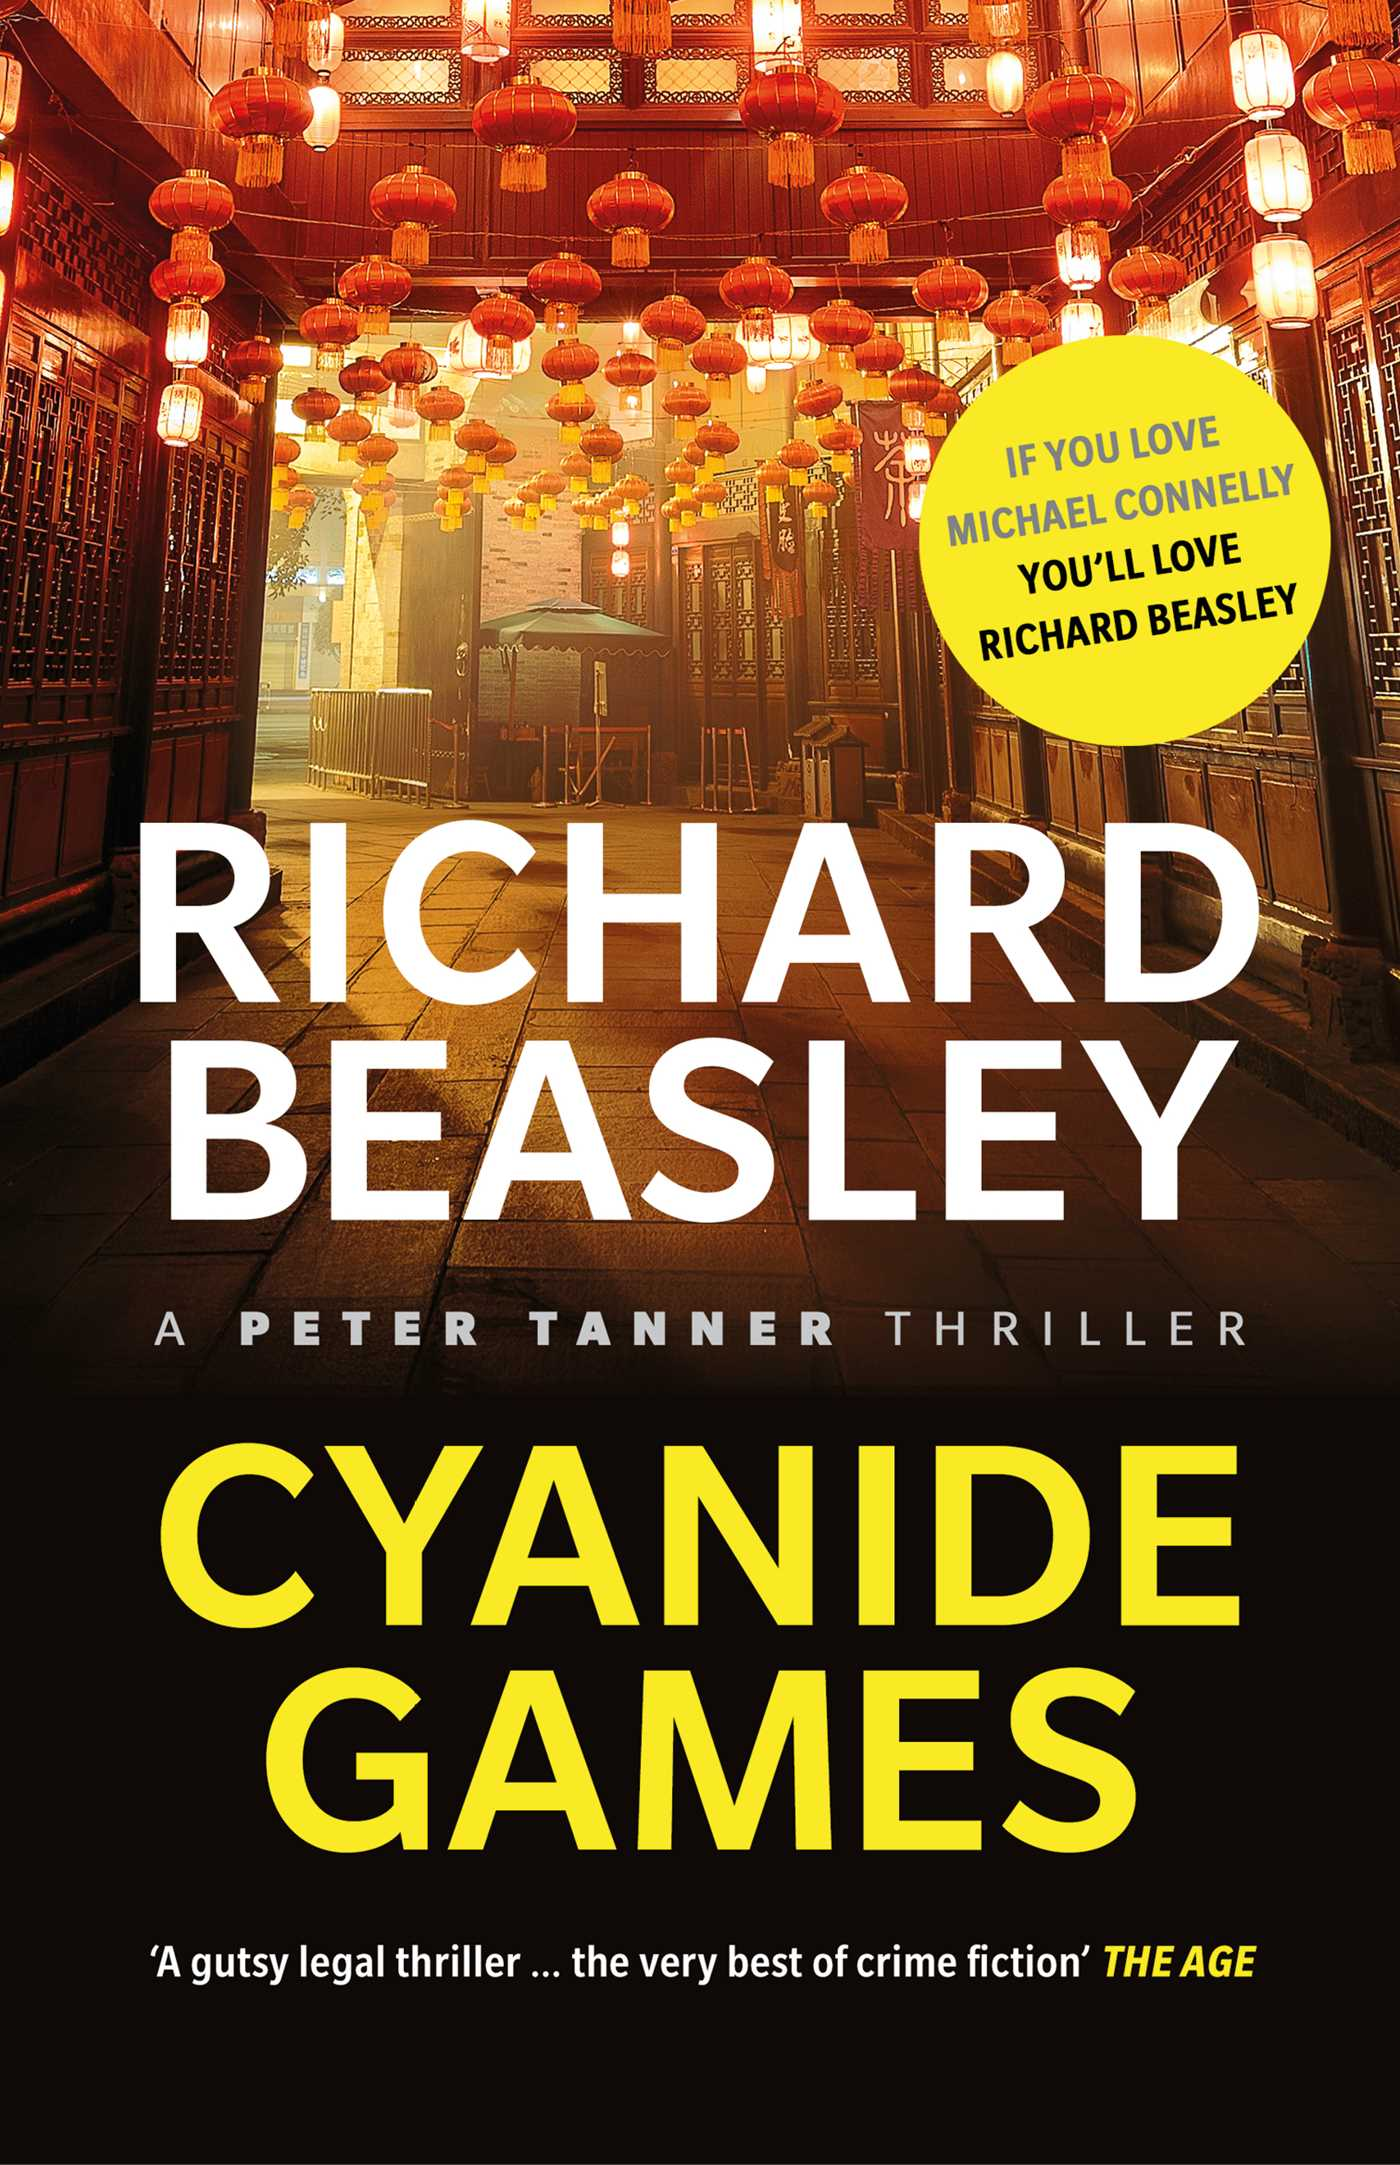 Cyanide games a peter tanner thriller 9781925368130 hr